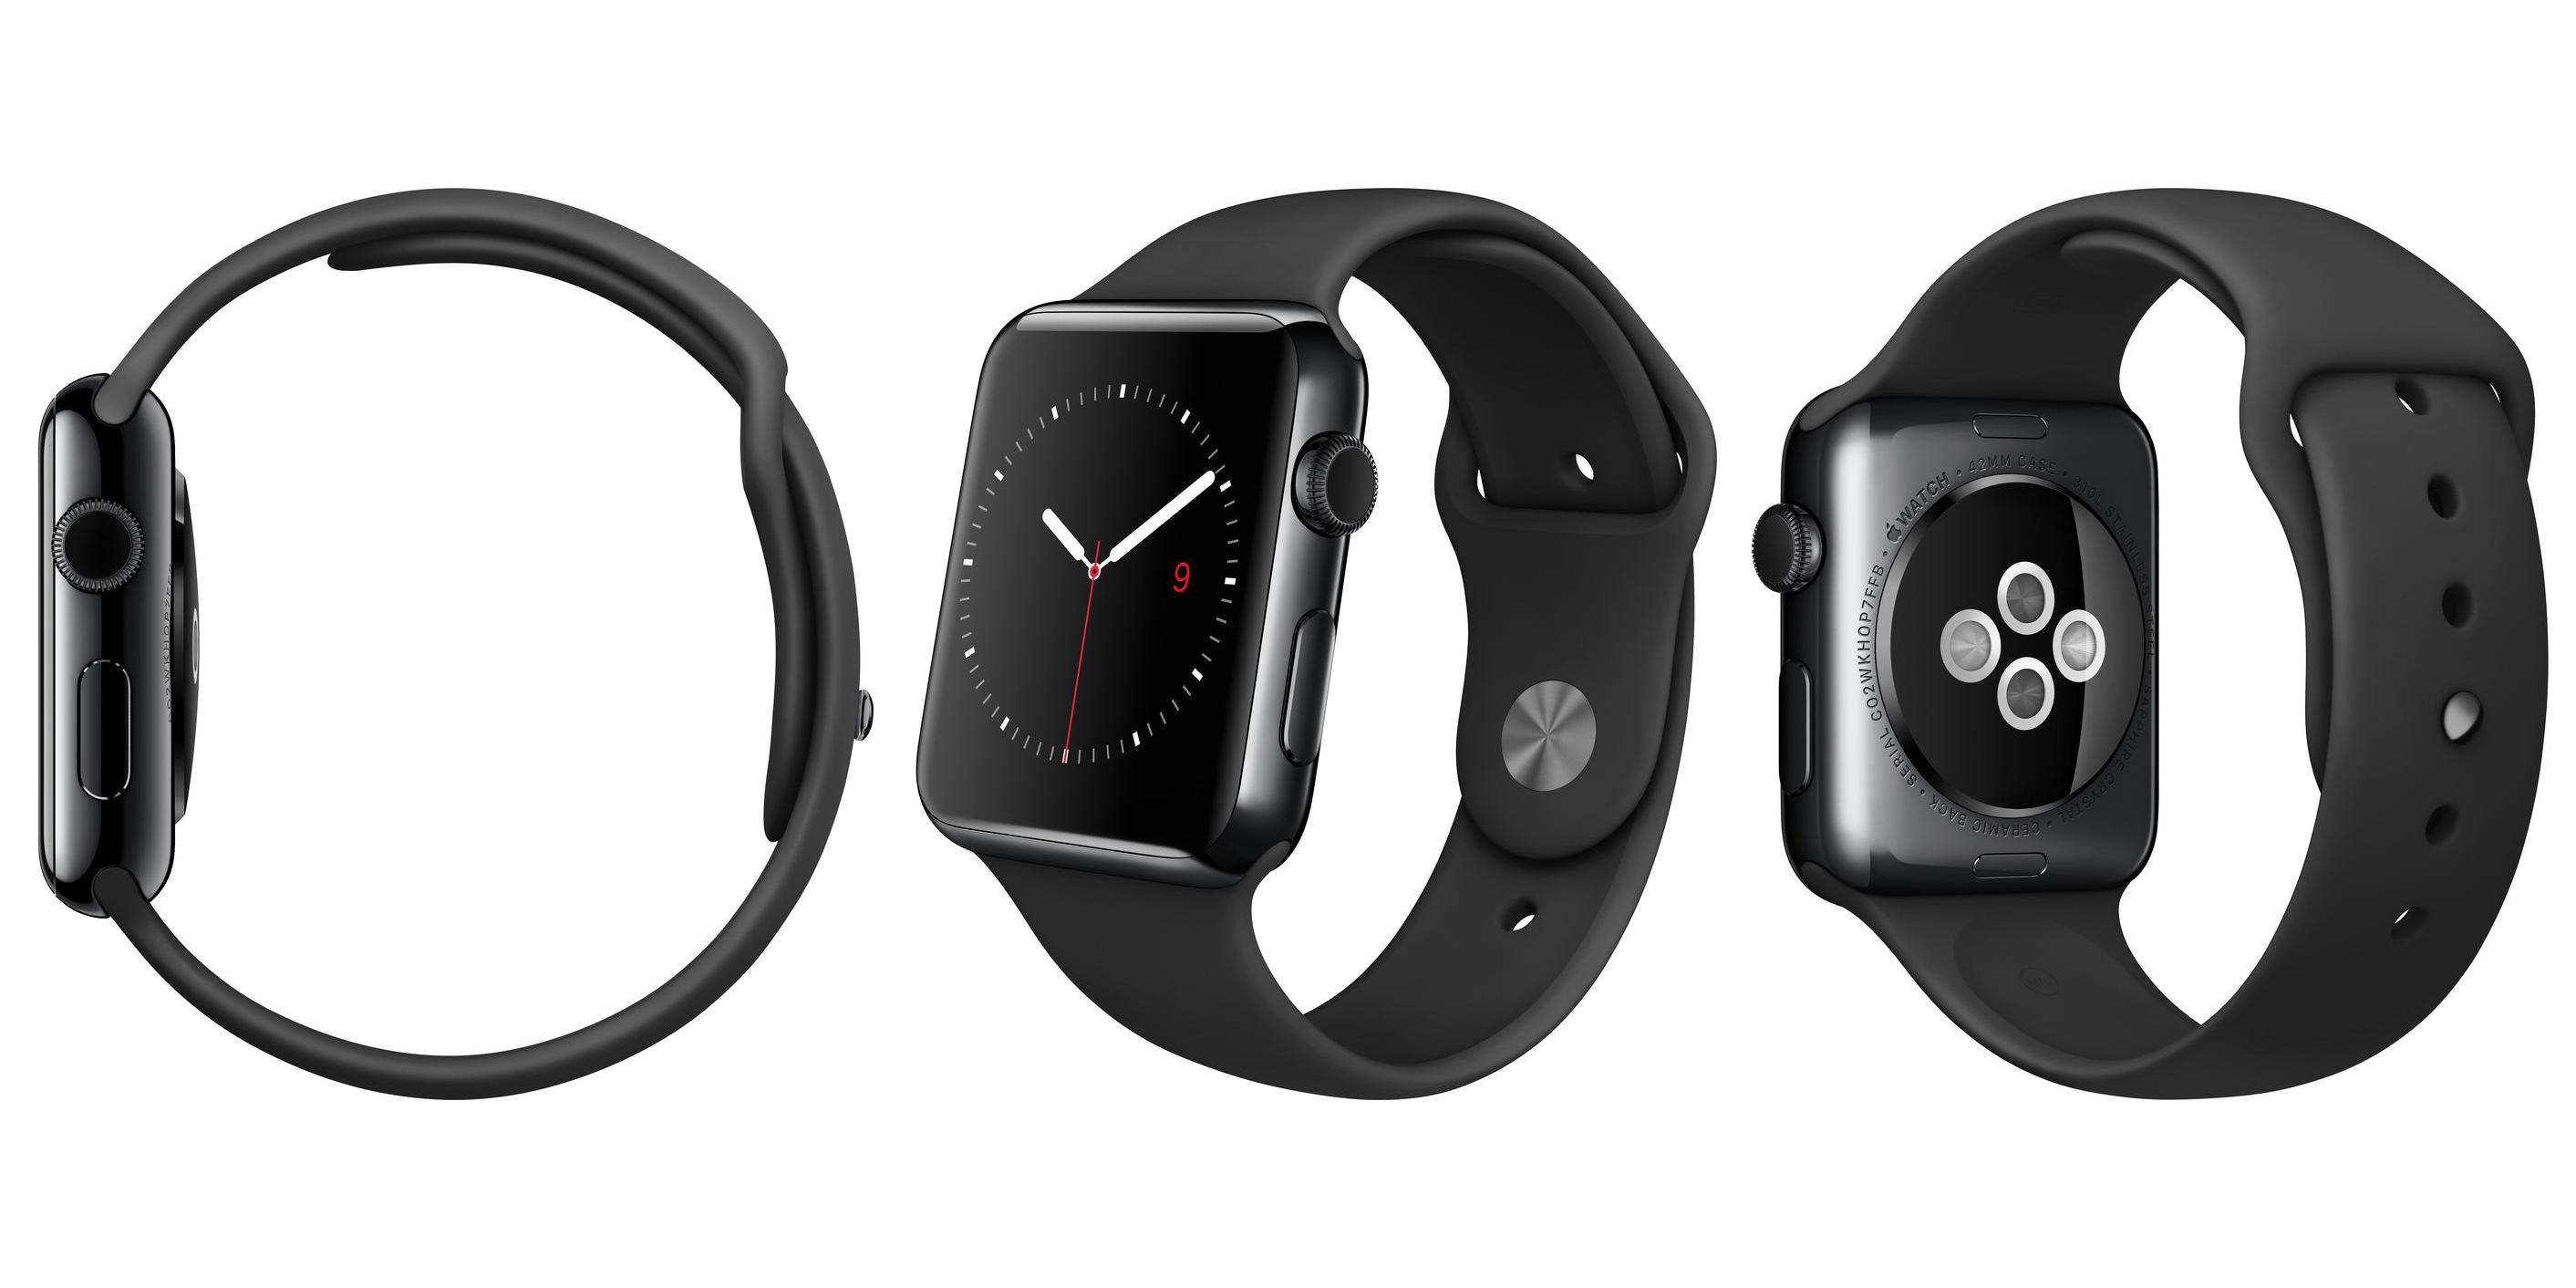 apple-watch-space-black-stainless-steel